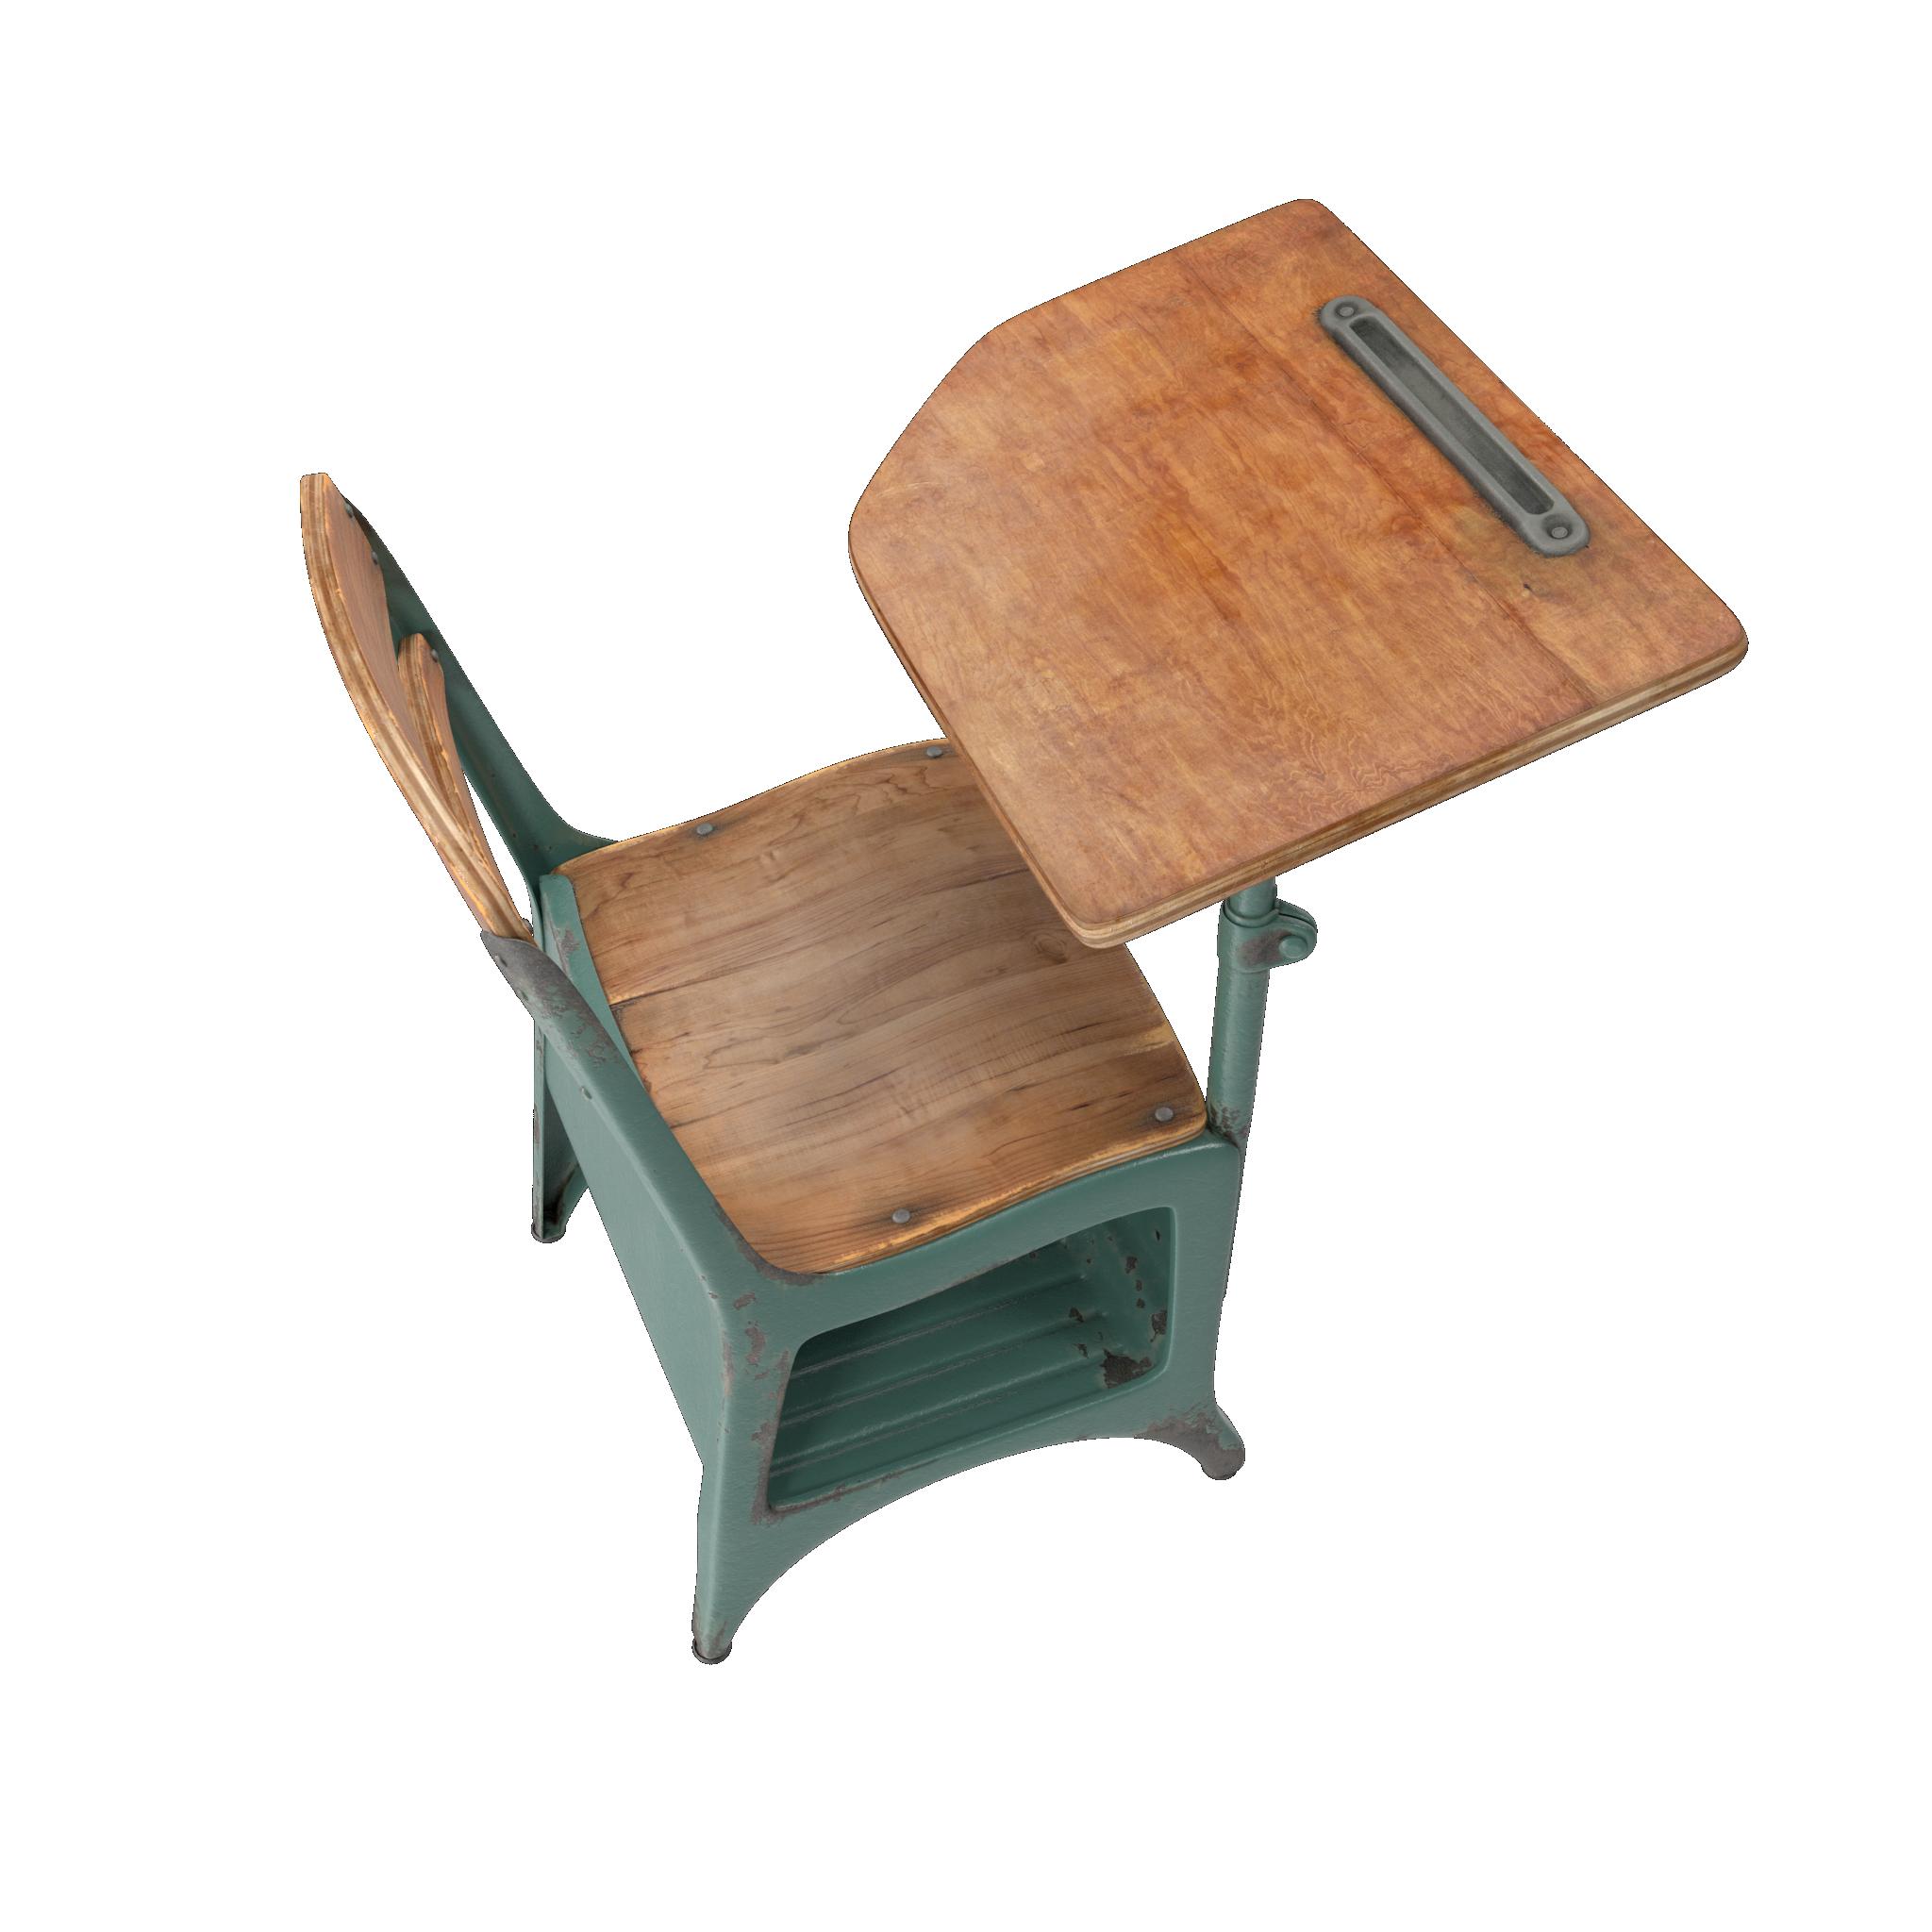 Antique School Desk PNG Image